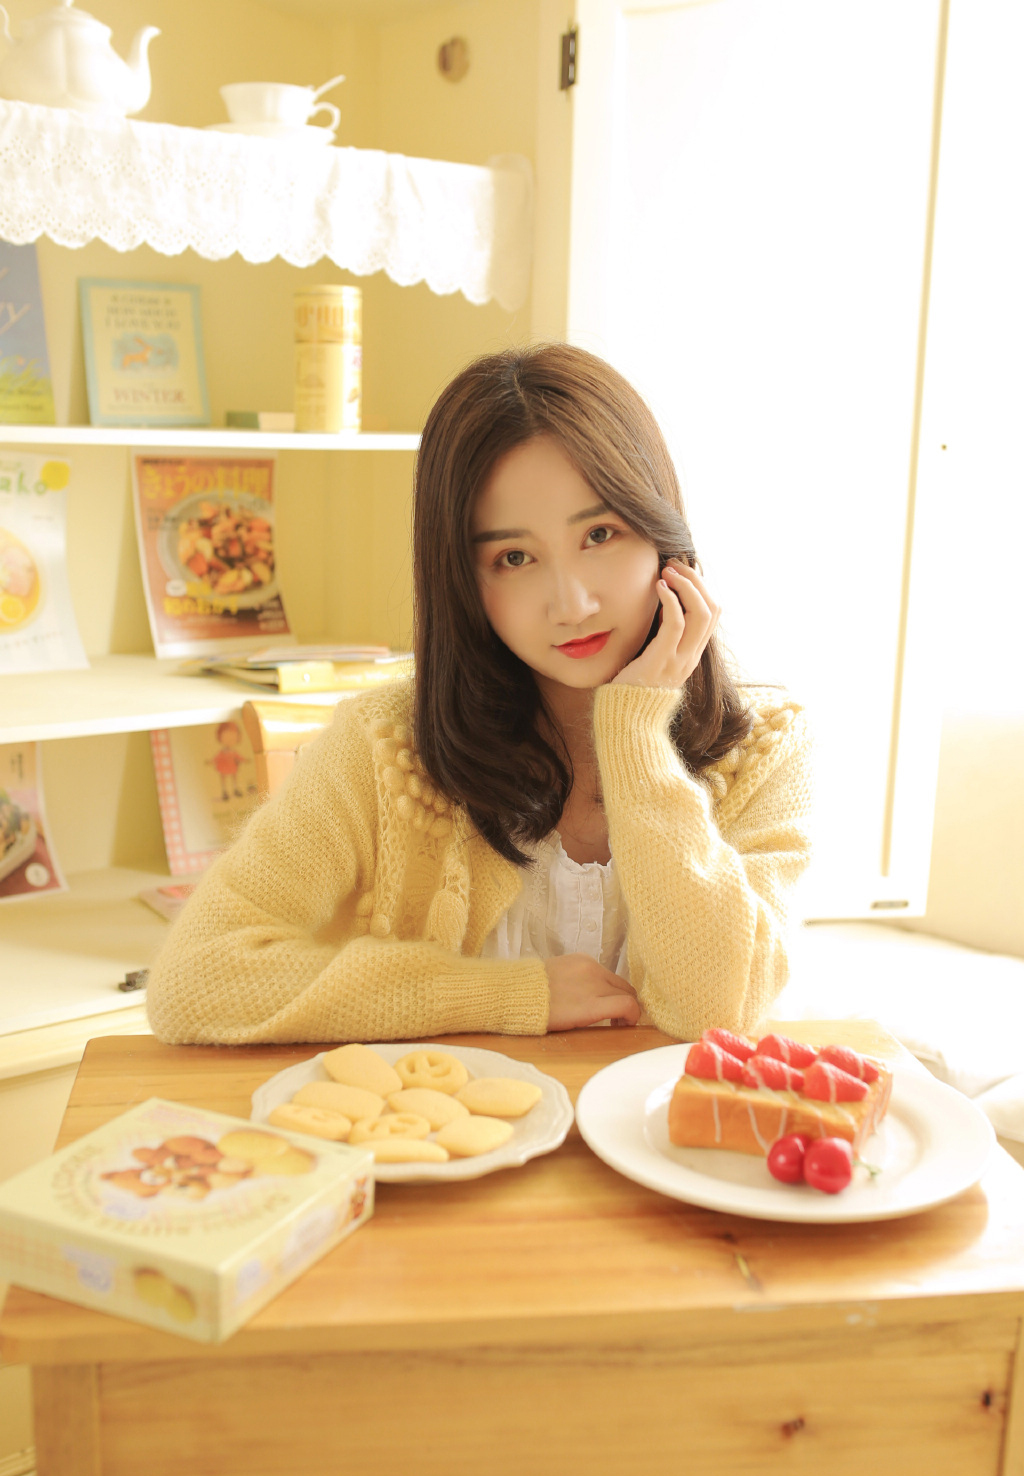 IPTD-886骨感大胸美女薄纱超短秀好身材